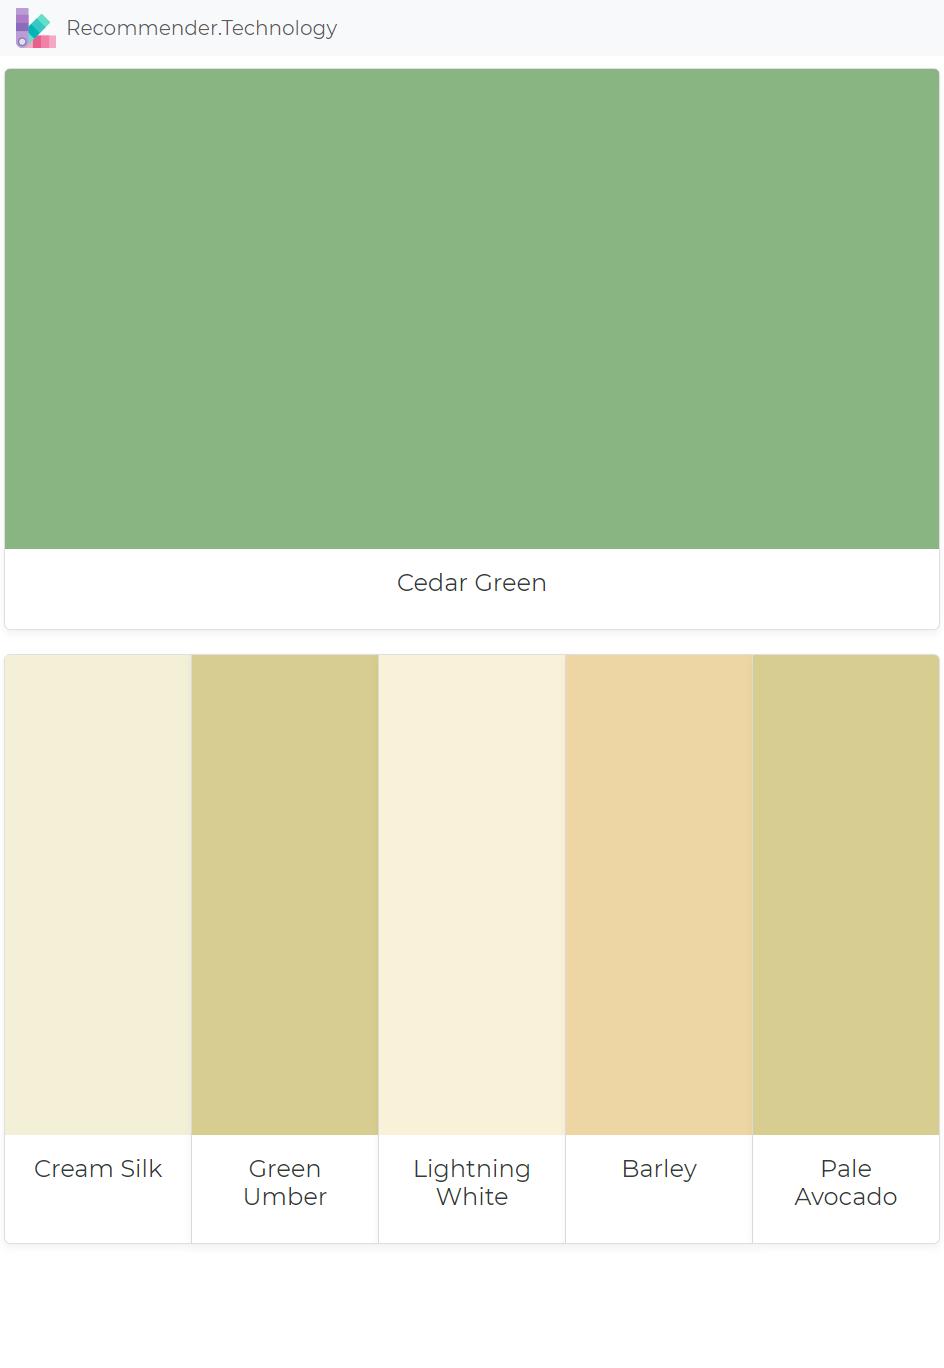 Cedar Green: Cream Silk, Green Umber, Lightning White, Barley, Pale ...